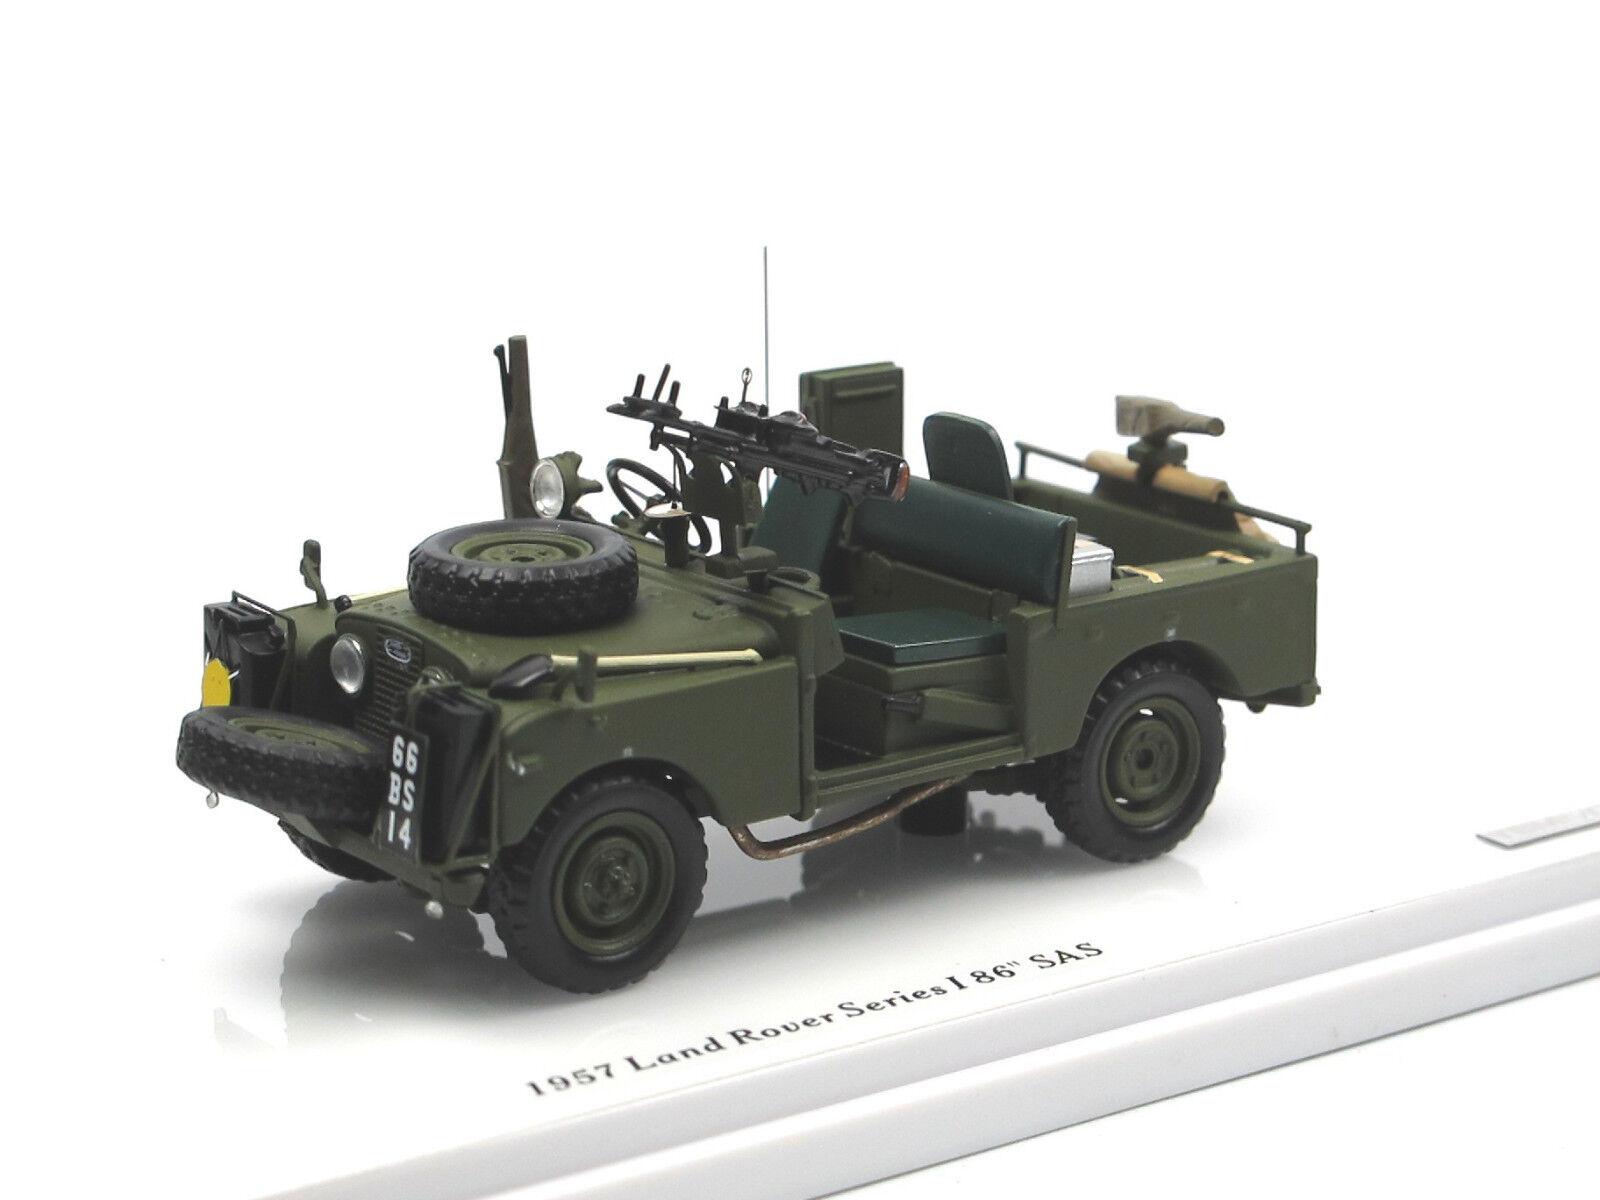 TSM MODEL 1957 LAND ROVER SERIES I 86  SAS Patrol Vehicle 1 43